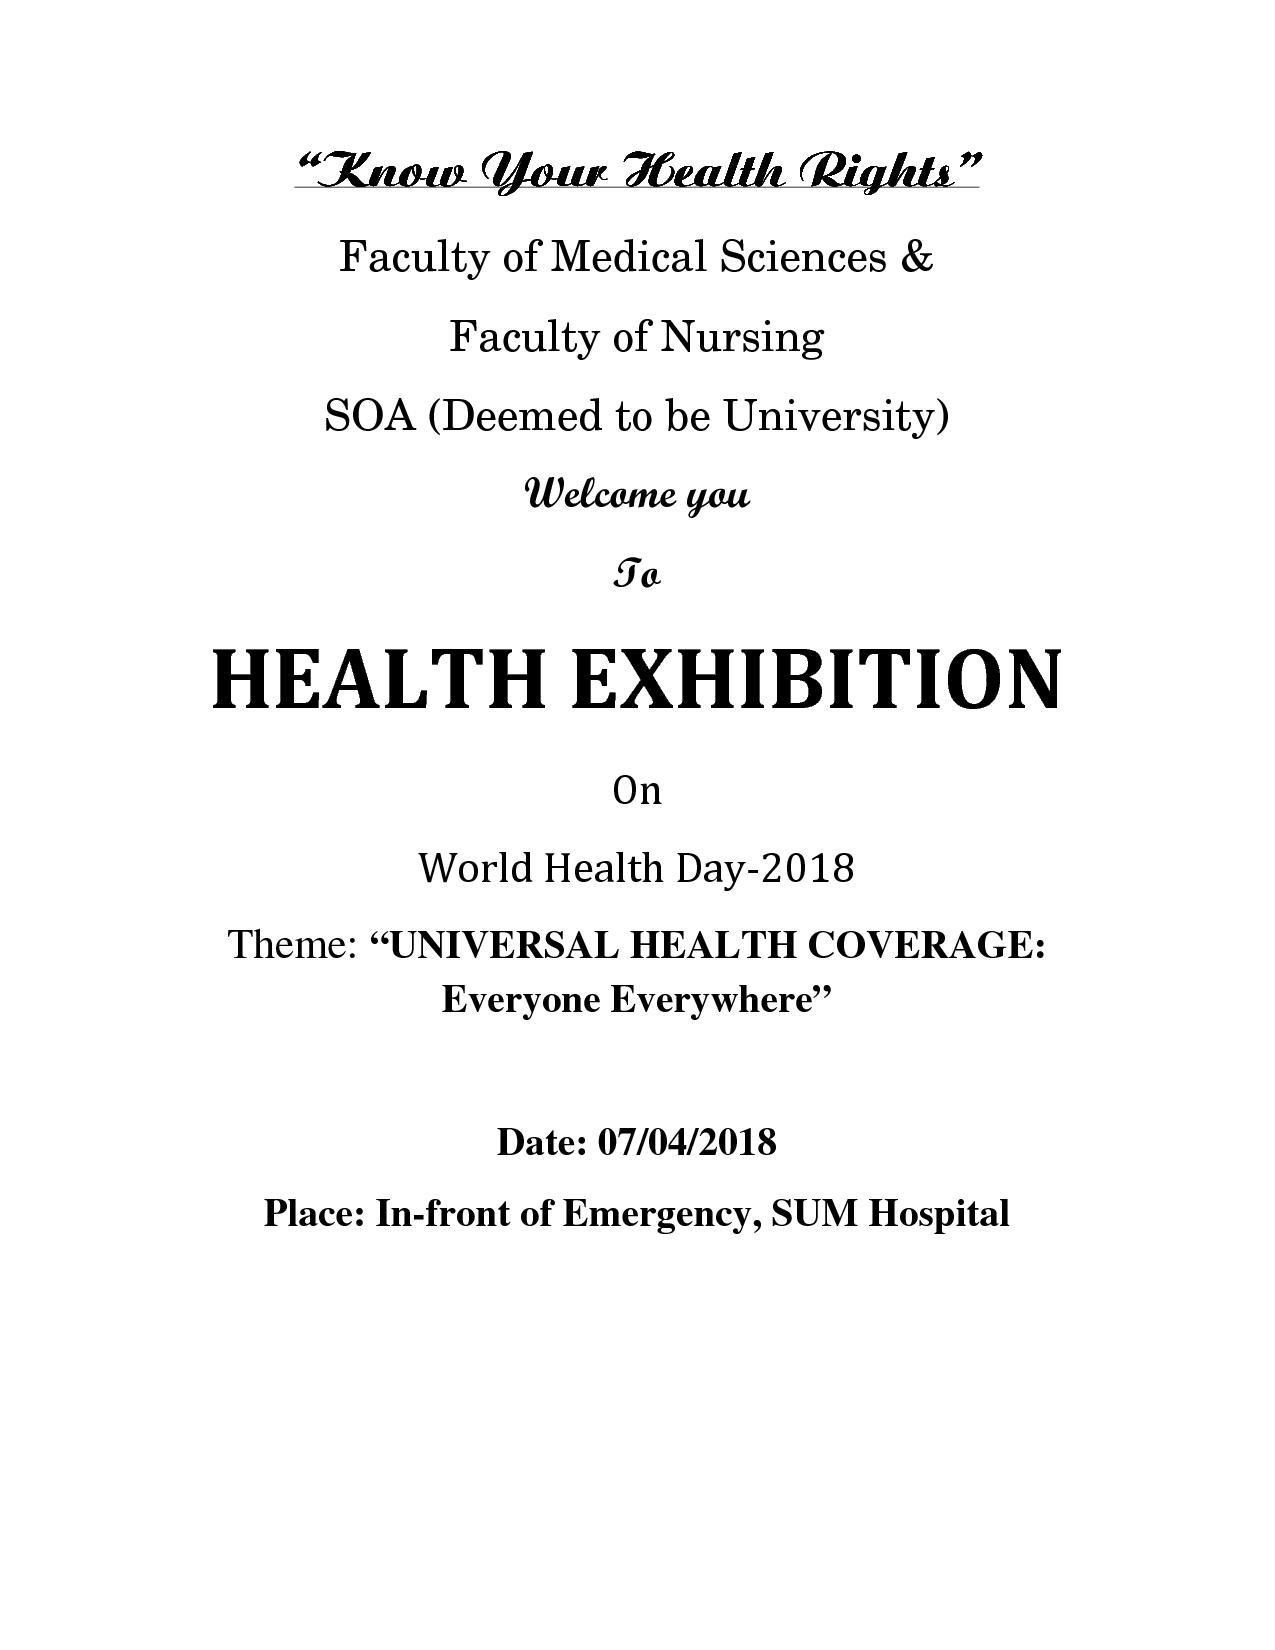 health exhibition1.jpg